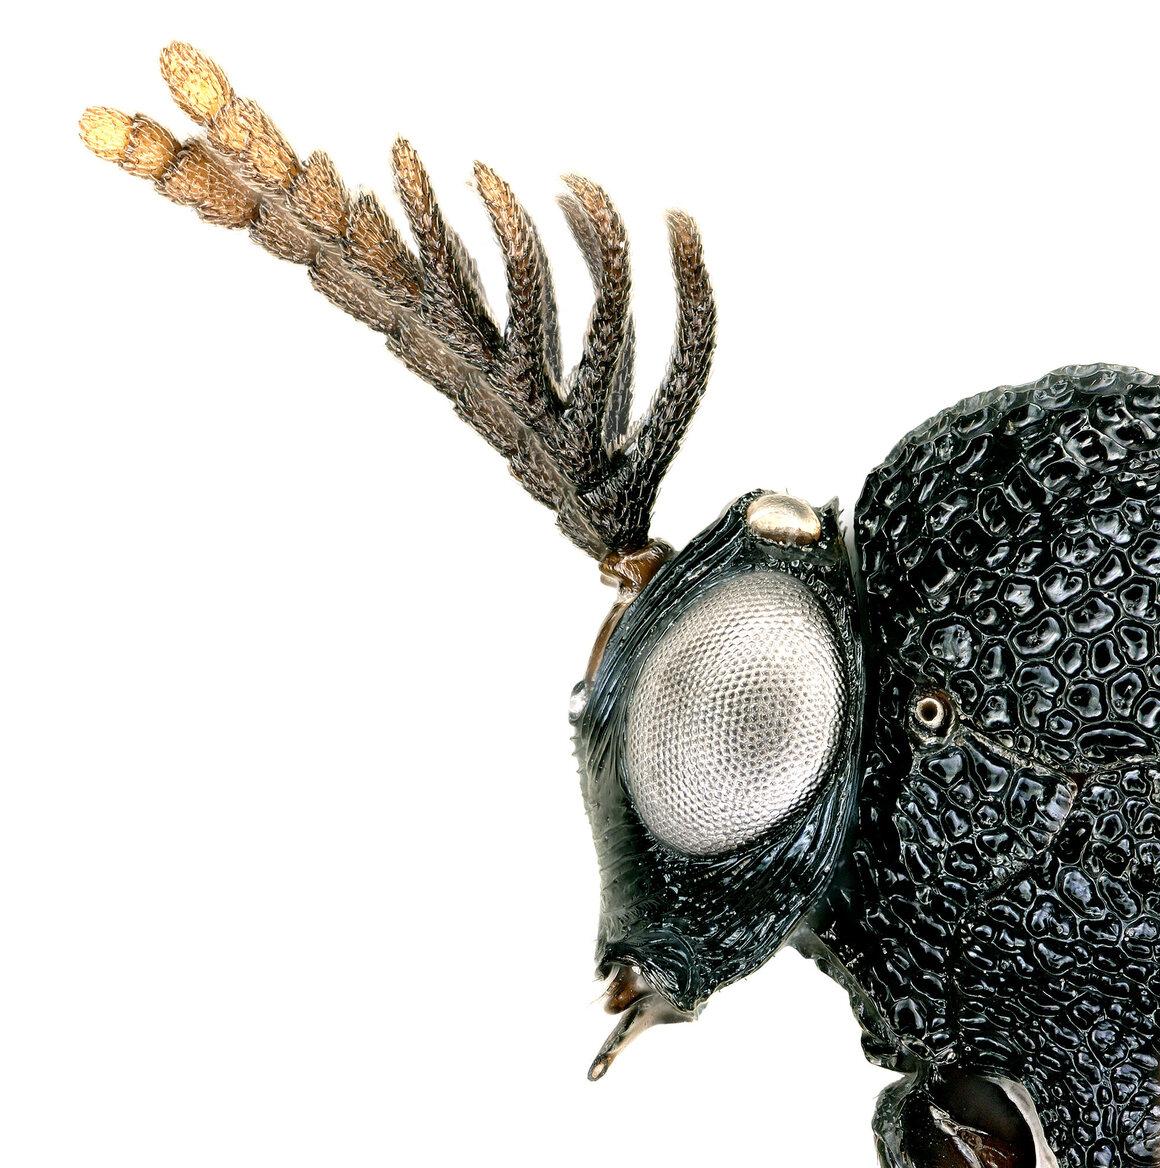 Eucharitid wasp, <em>Pseudochalcura gibbosa</em>.